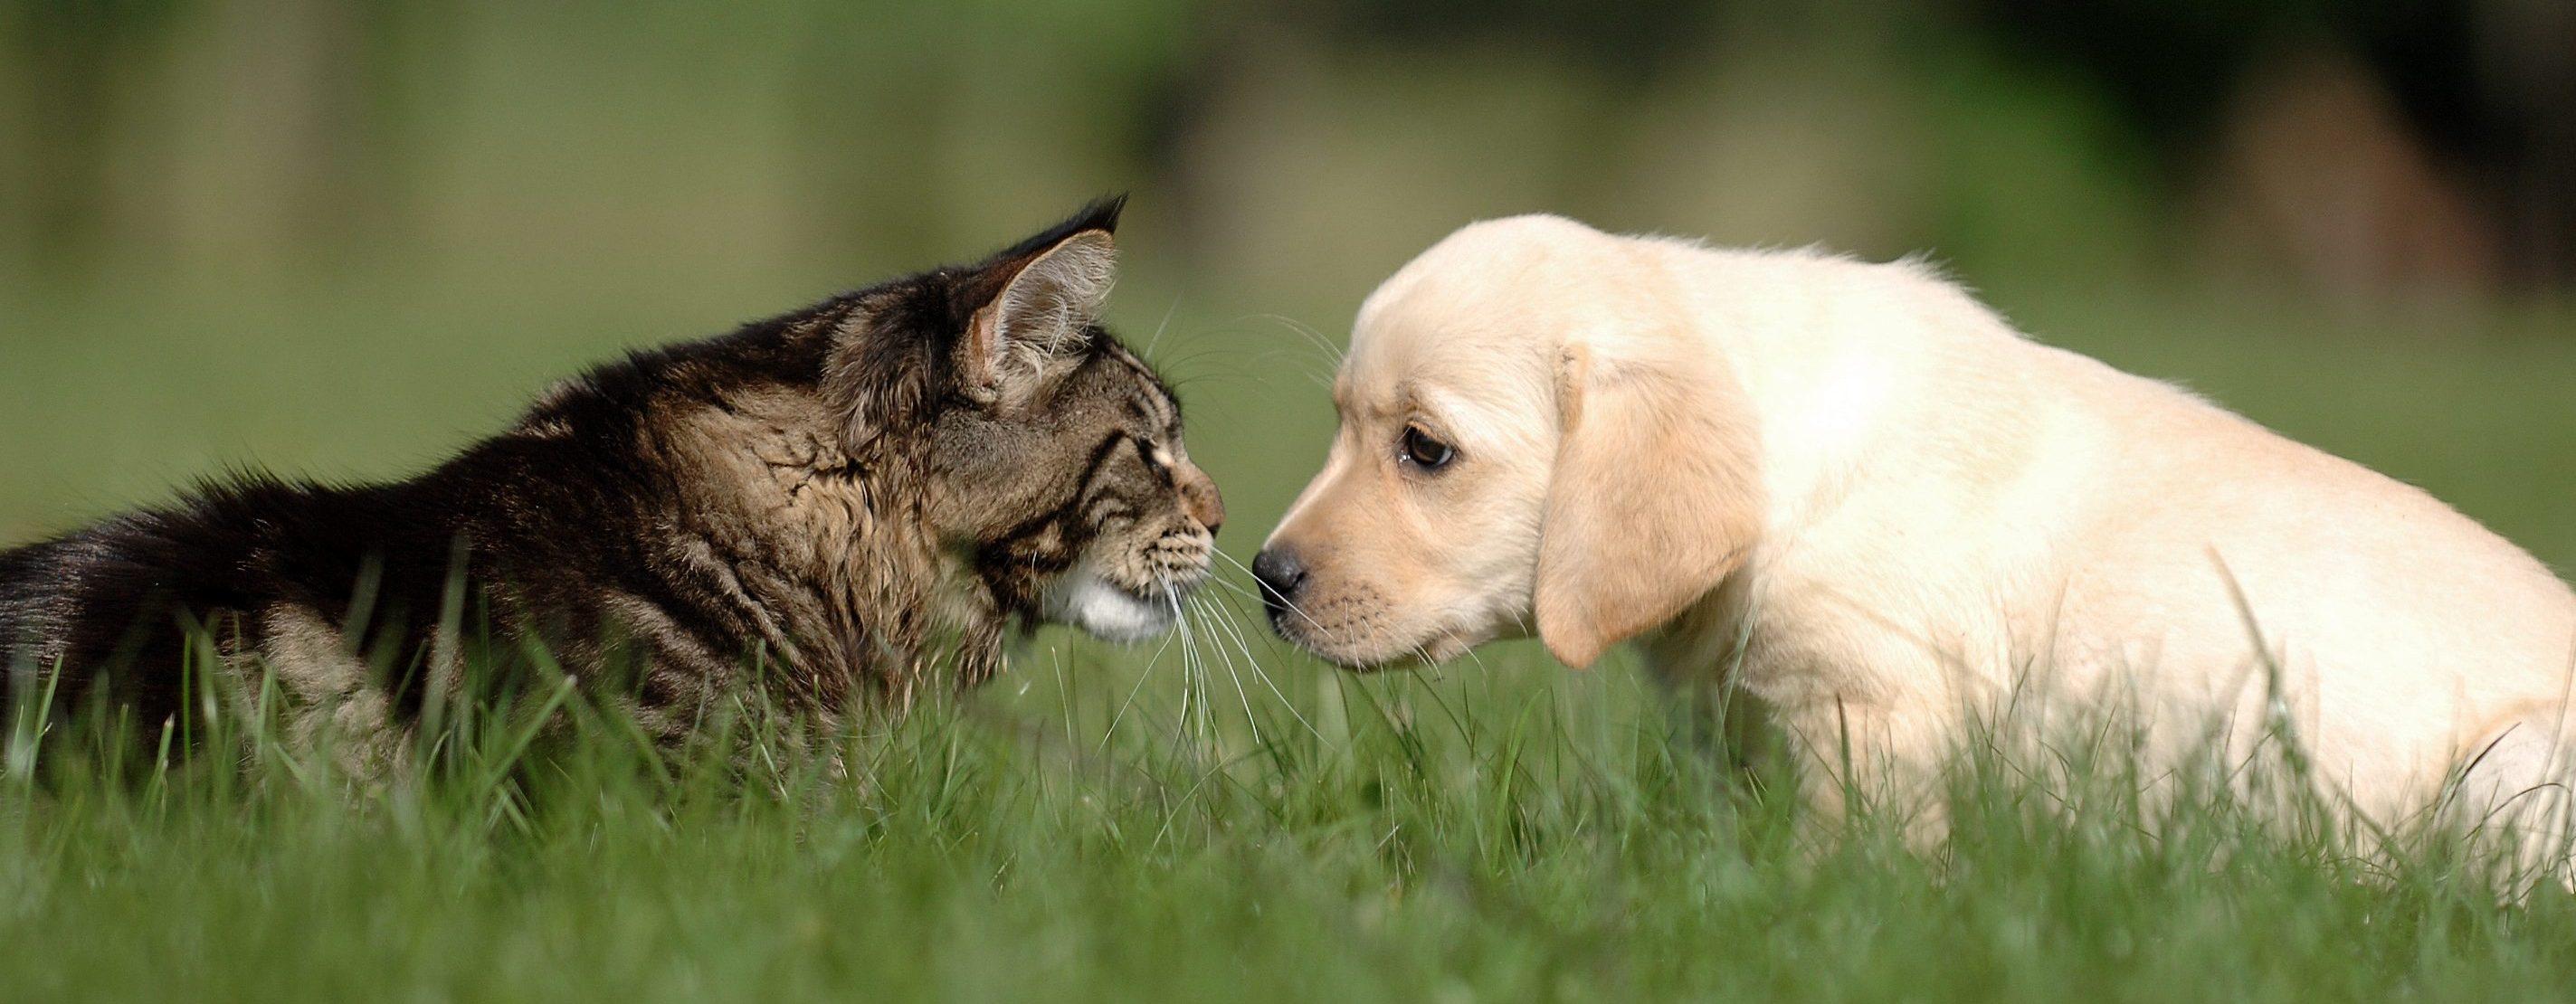 Cat Kissing Dog Gif